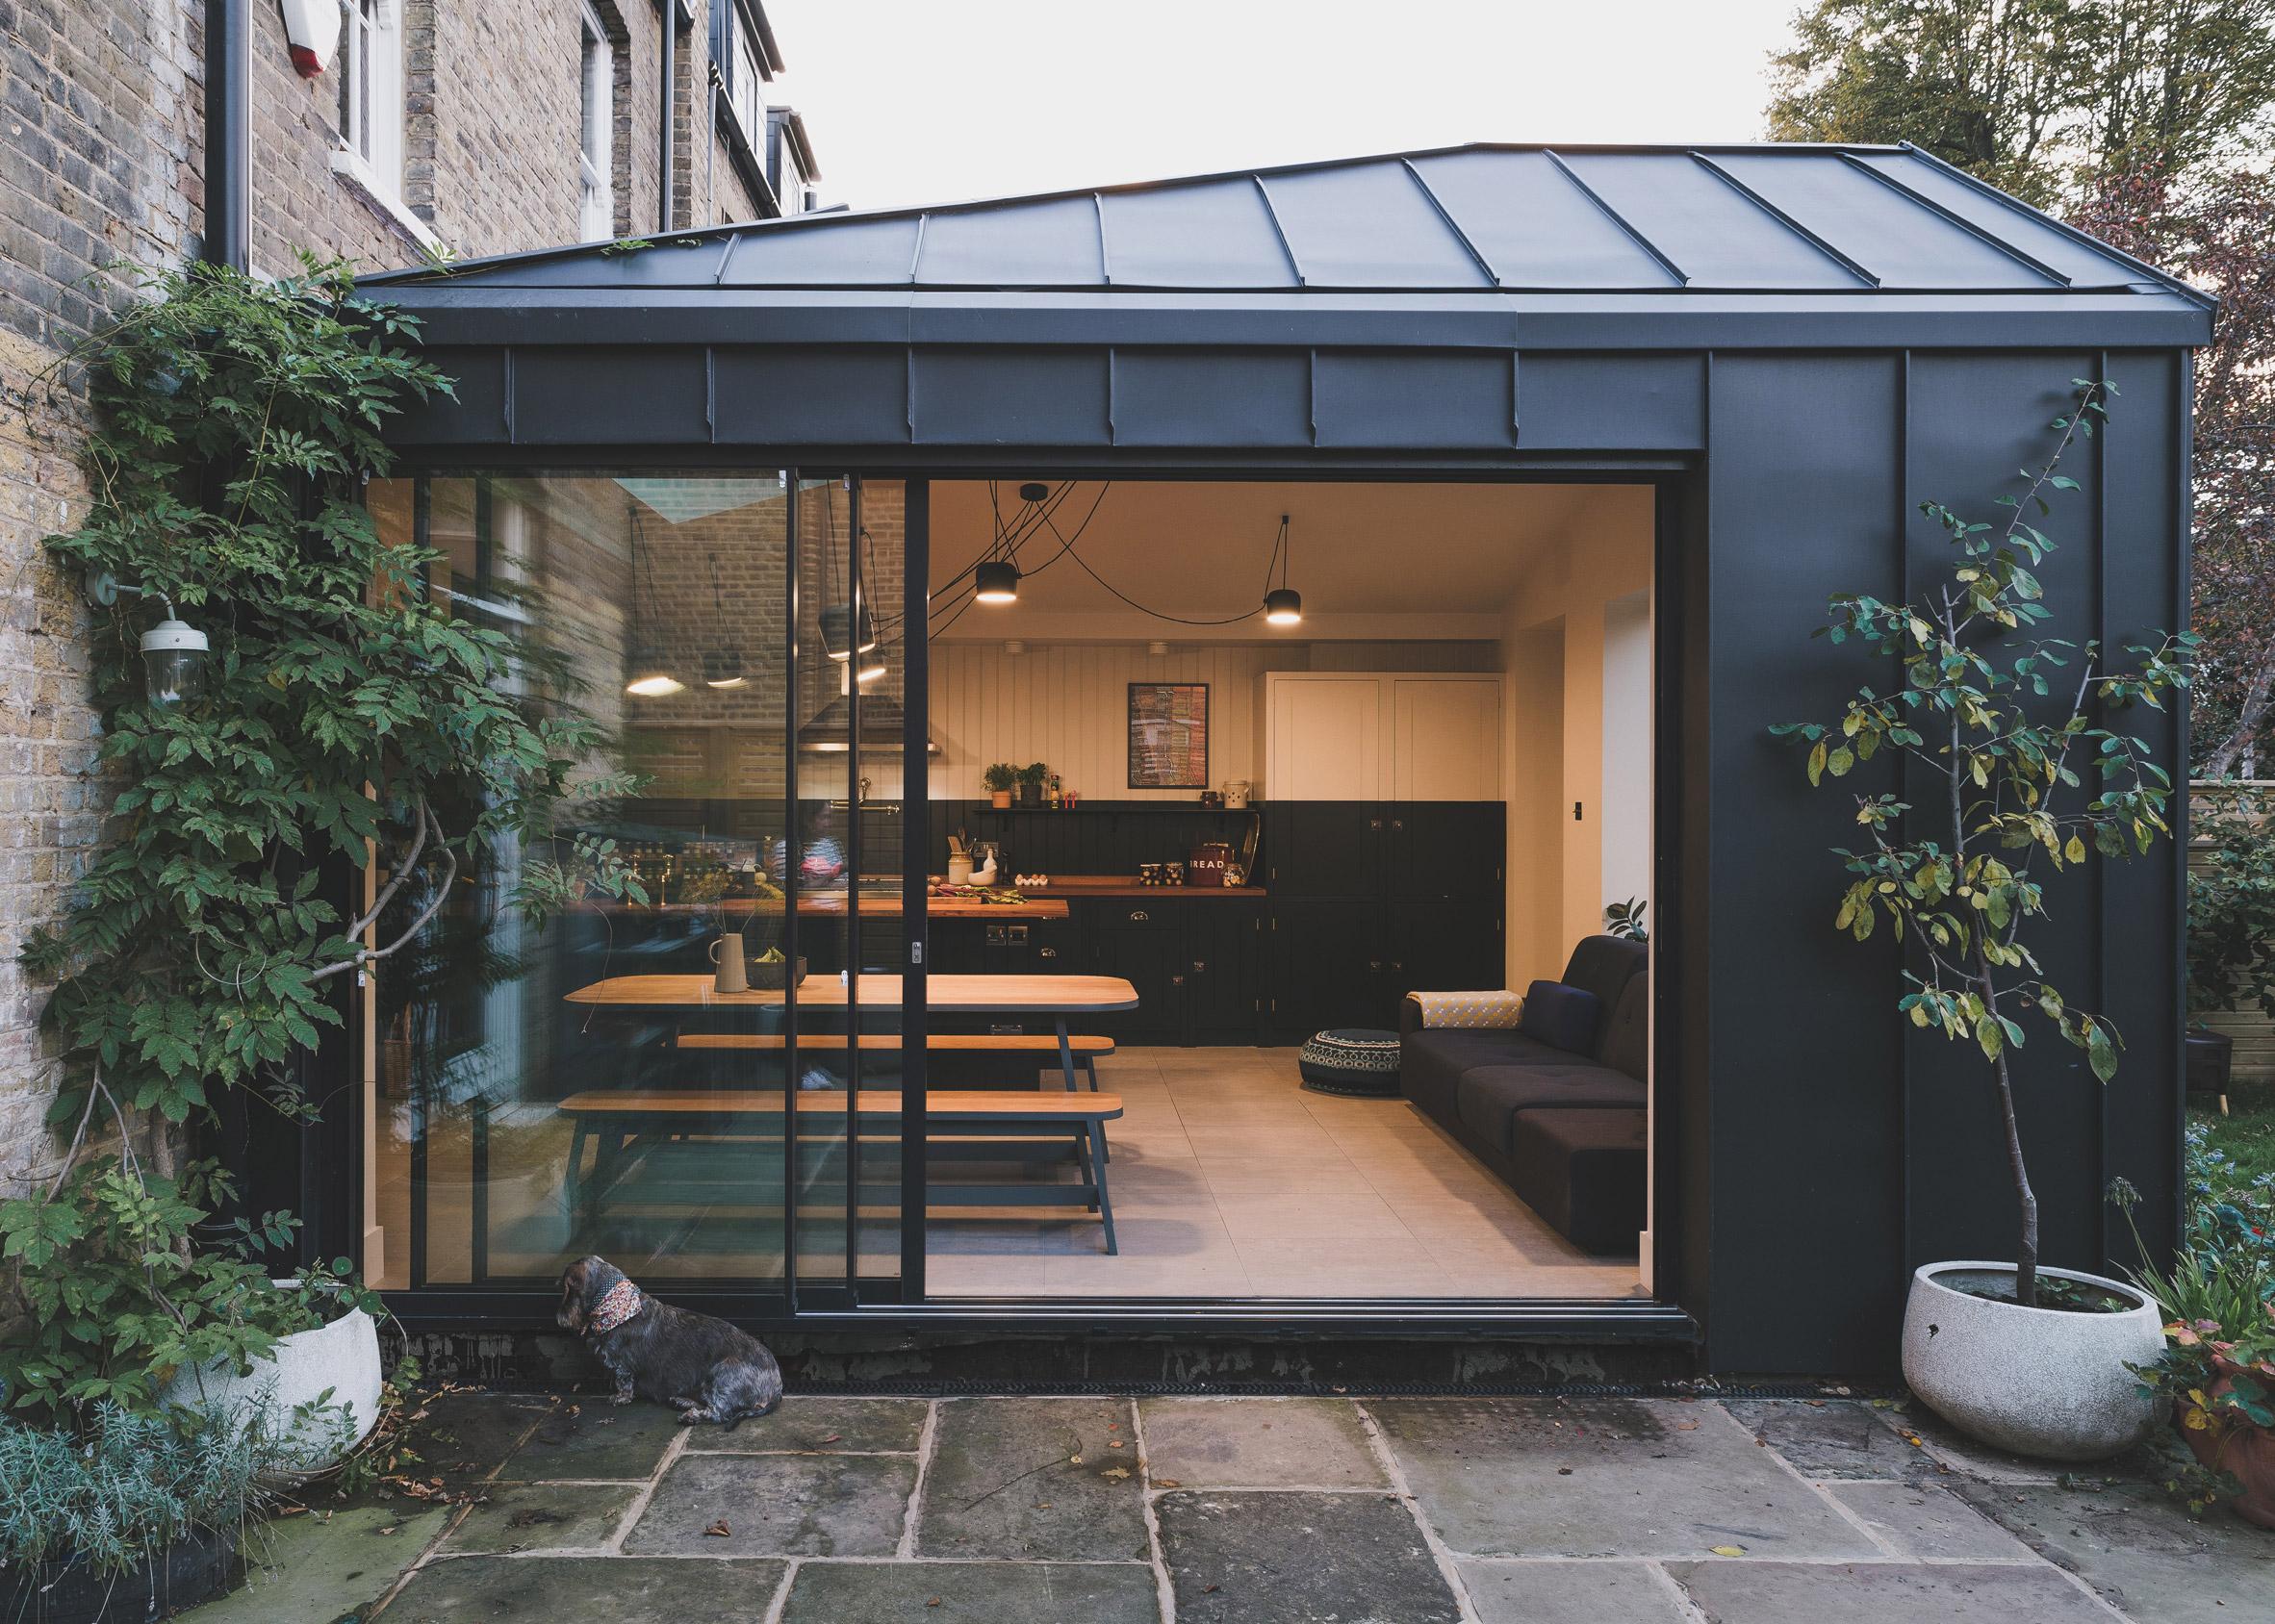 Micheldever Road, Lewisham, by Meme Architects